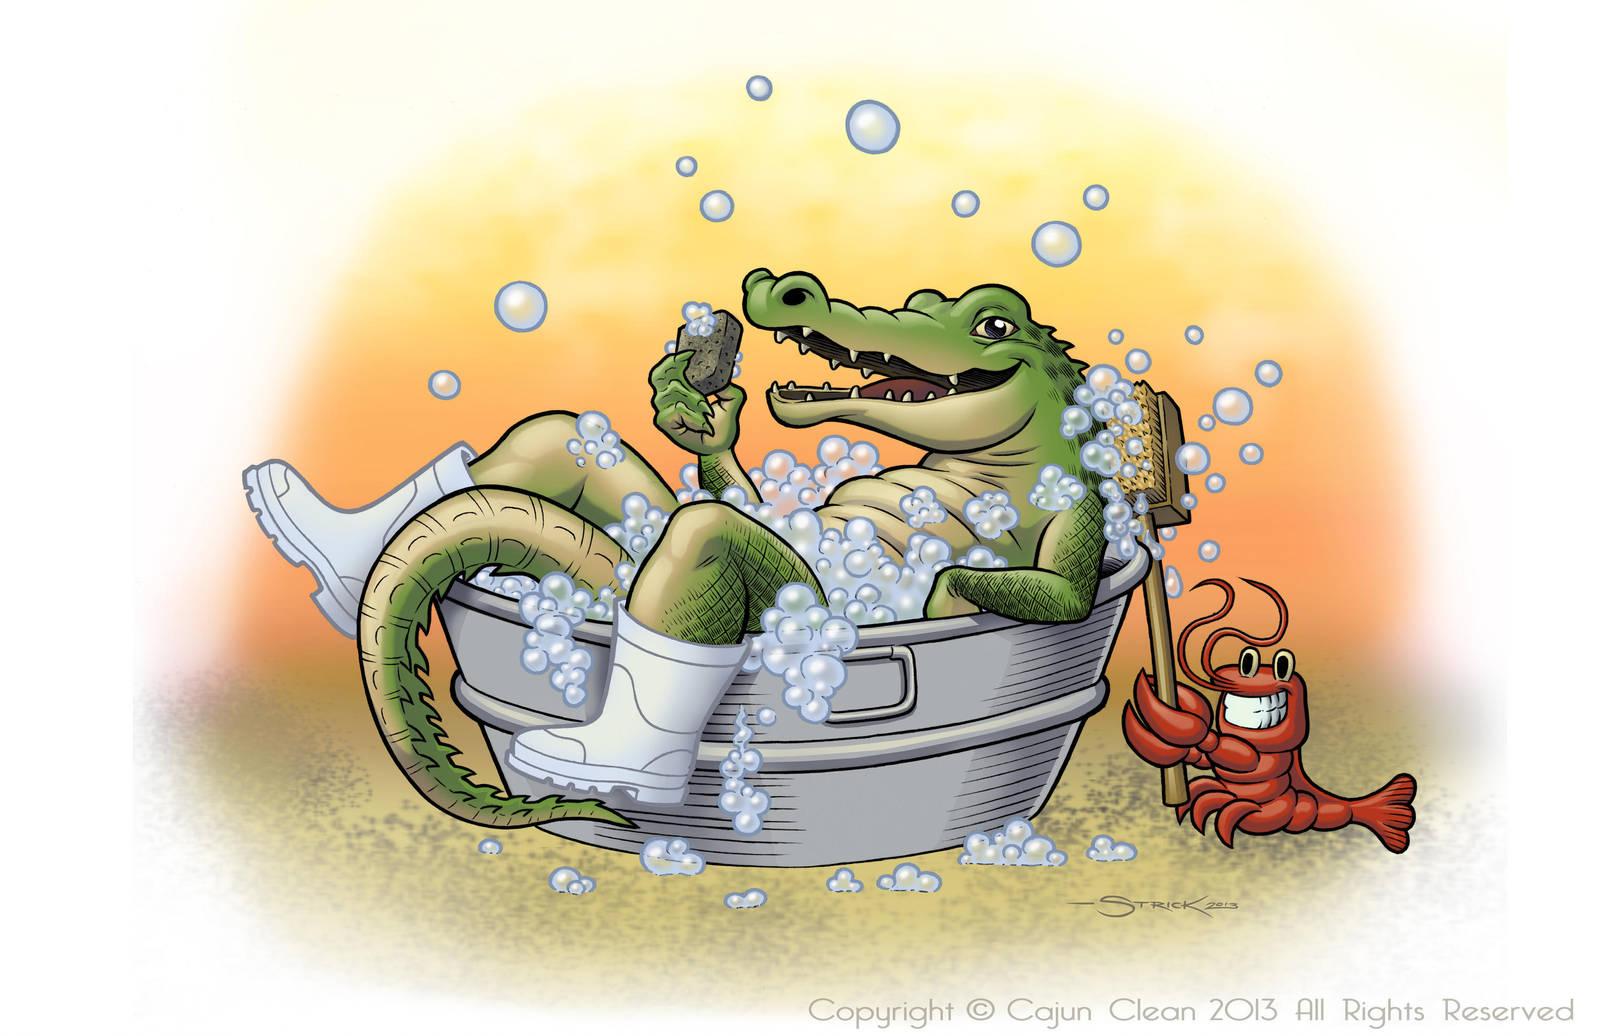 Cajun Clean Gator 2 by strickart